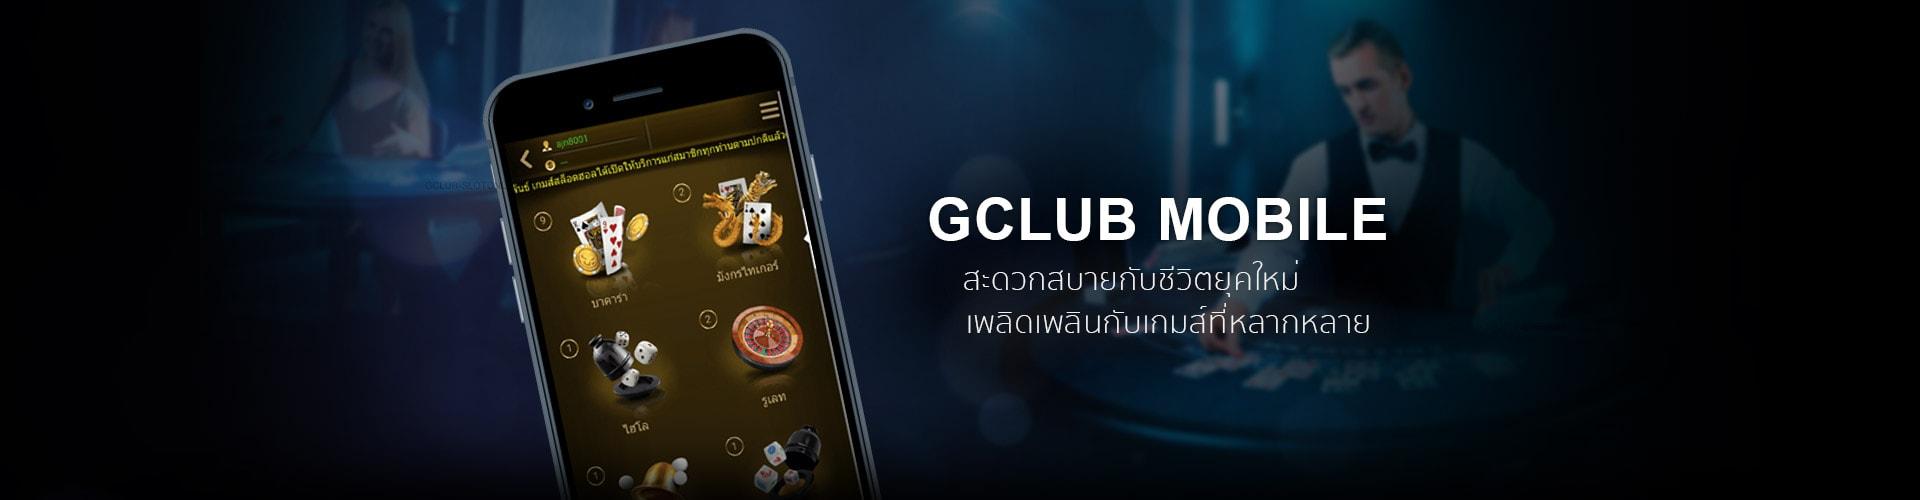 gclub mobile royal online มือถือ